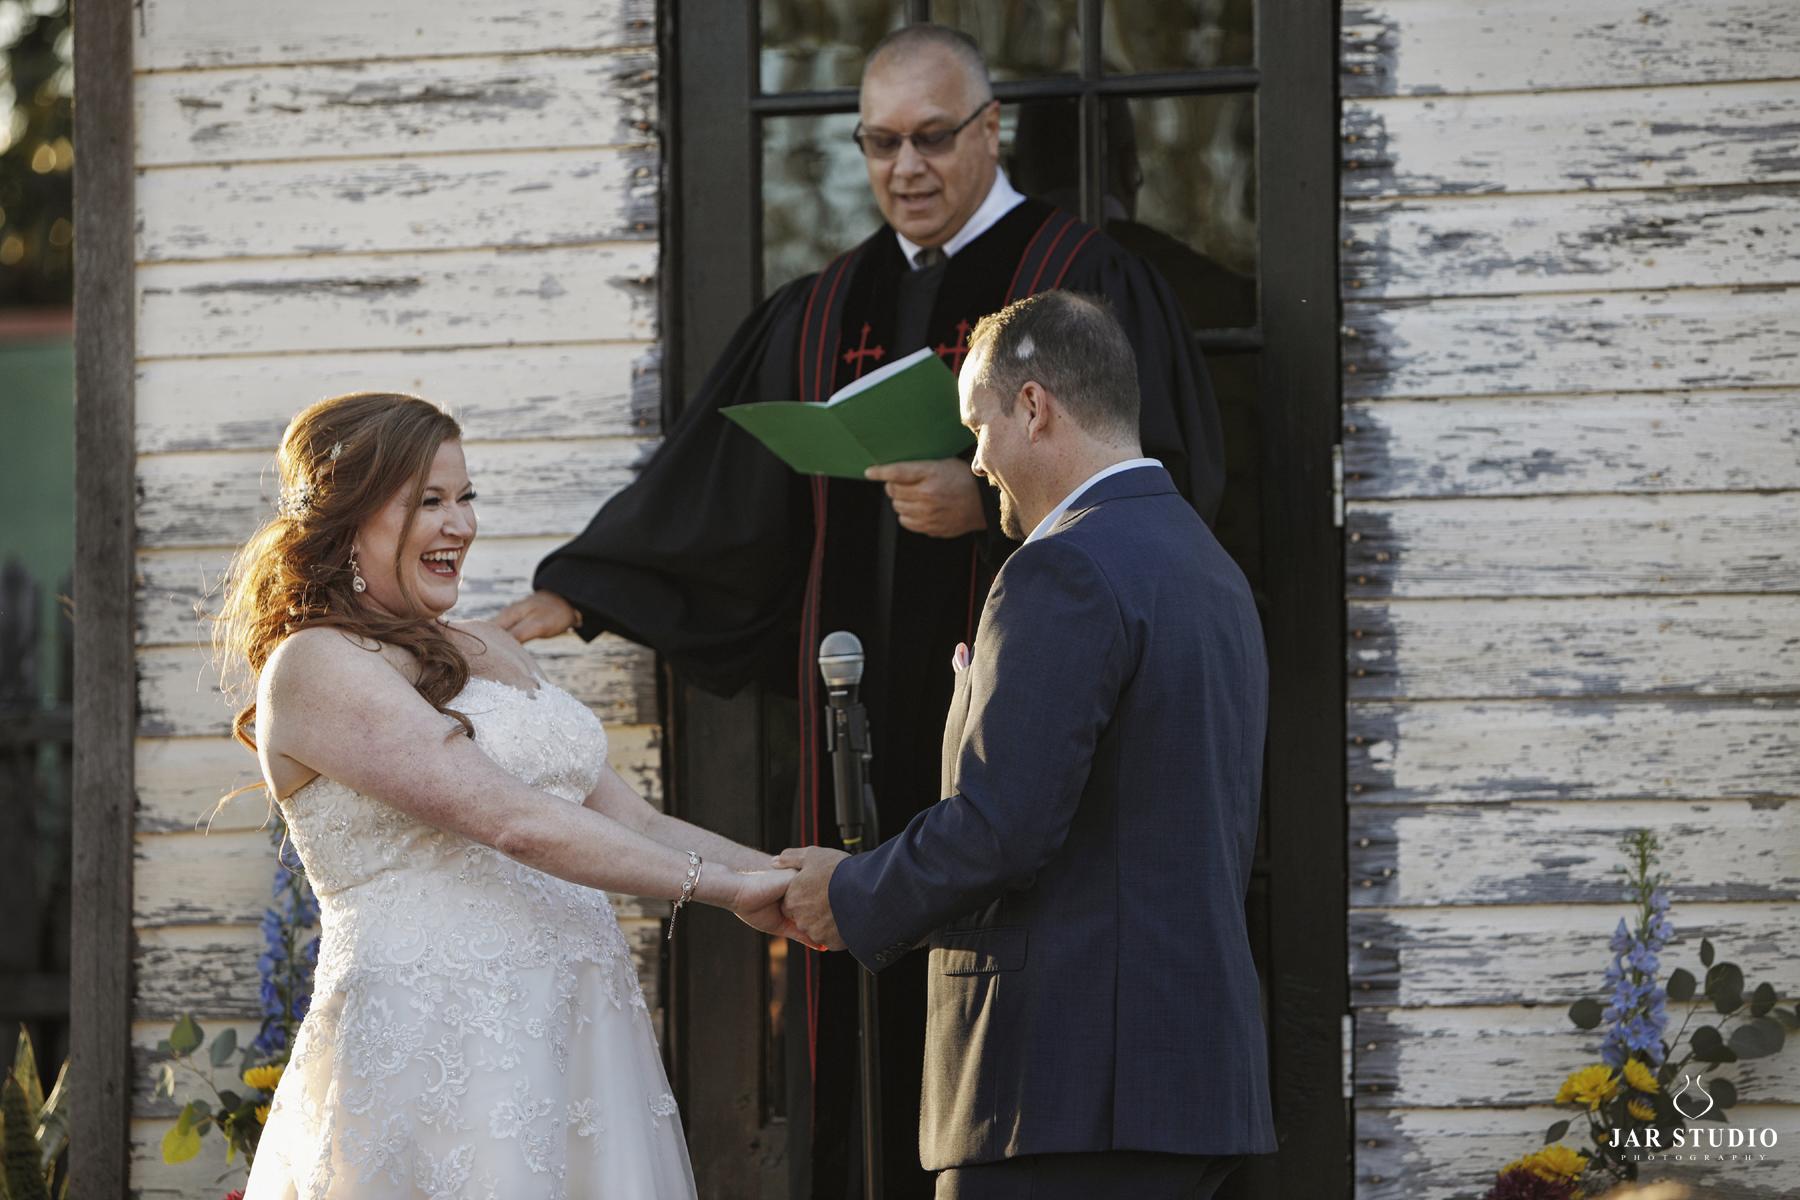 24-fun-wedding-vows-jarstudio-photography.JPG